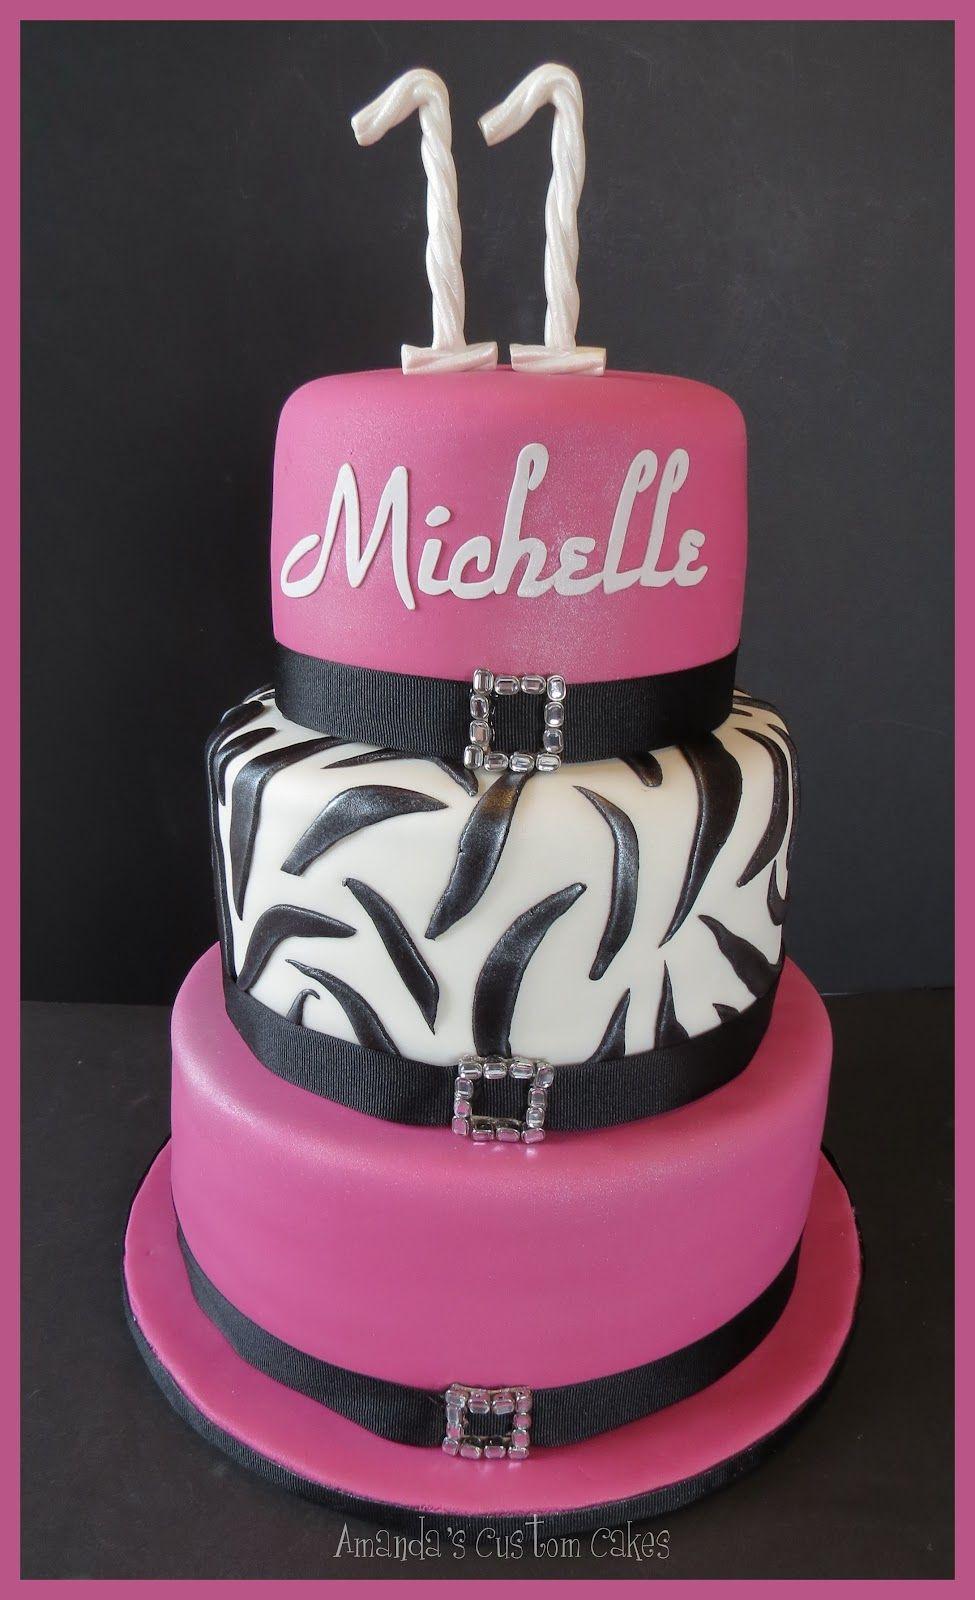 11th Birthday Cakes For Girls Amandas Custom Cakes Girly 11th